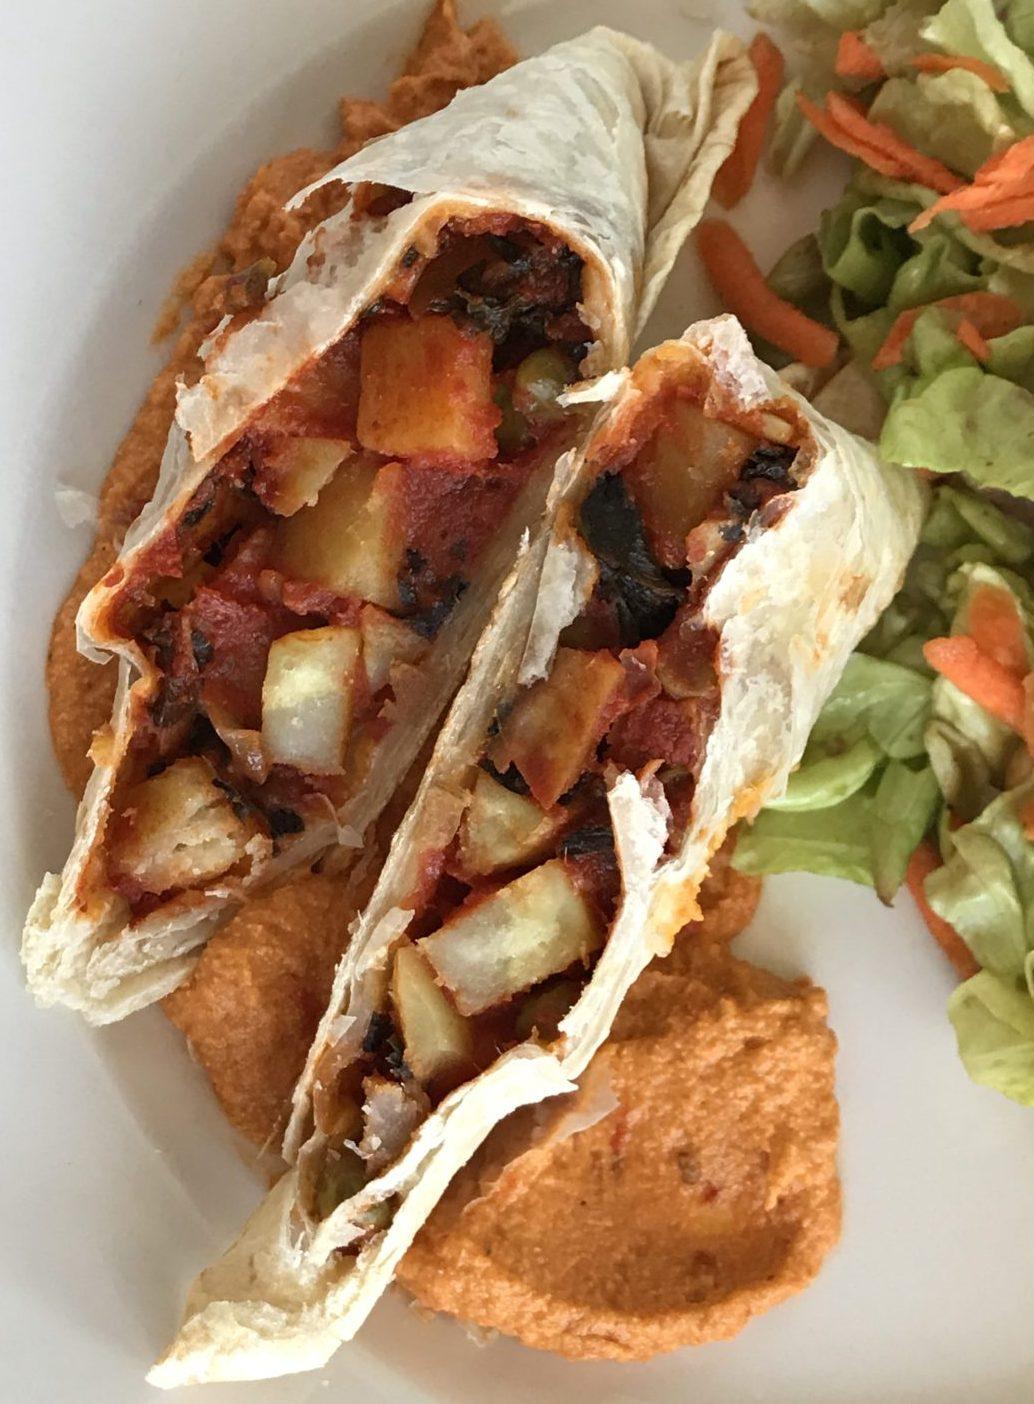 Super veggie sandwich pockets by Eat Like a Yogi